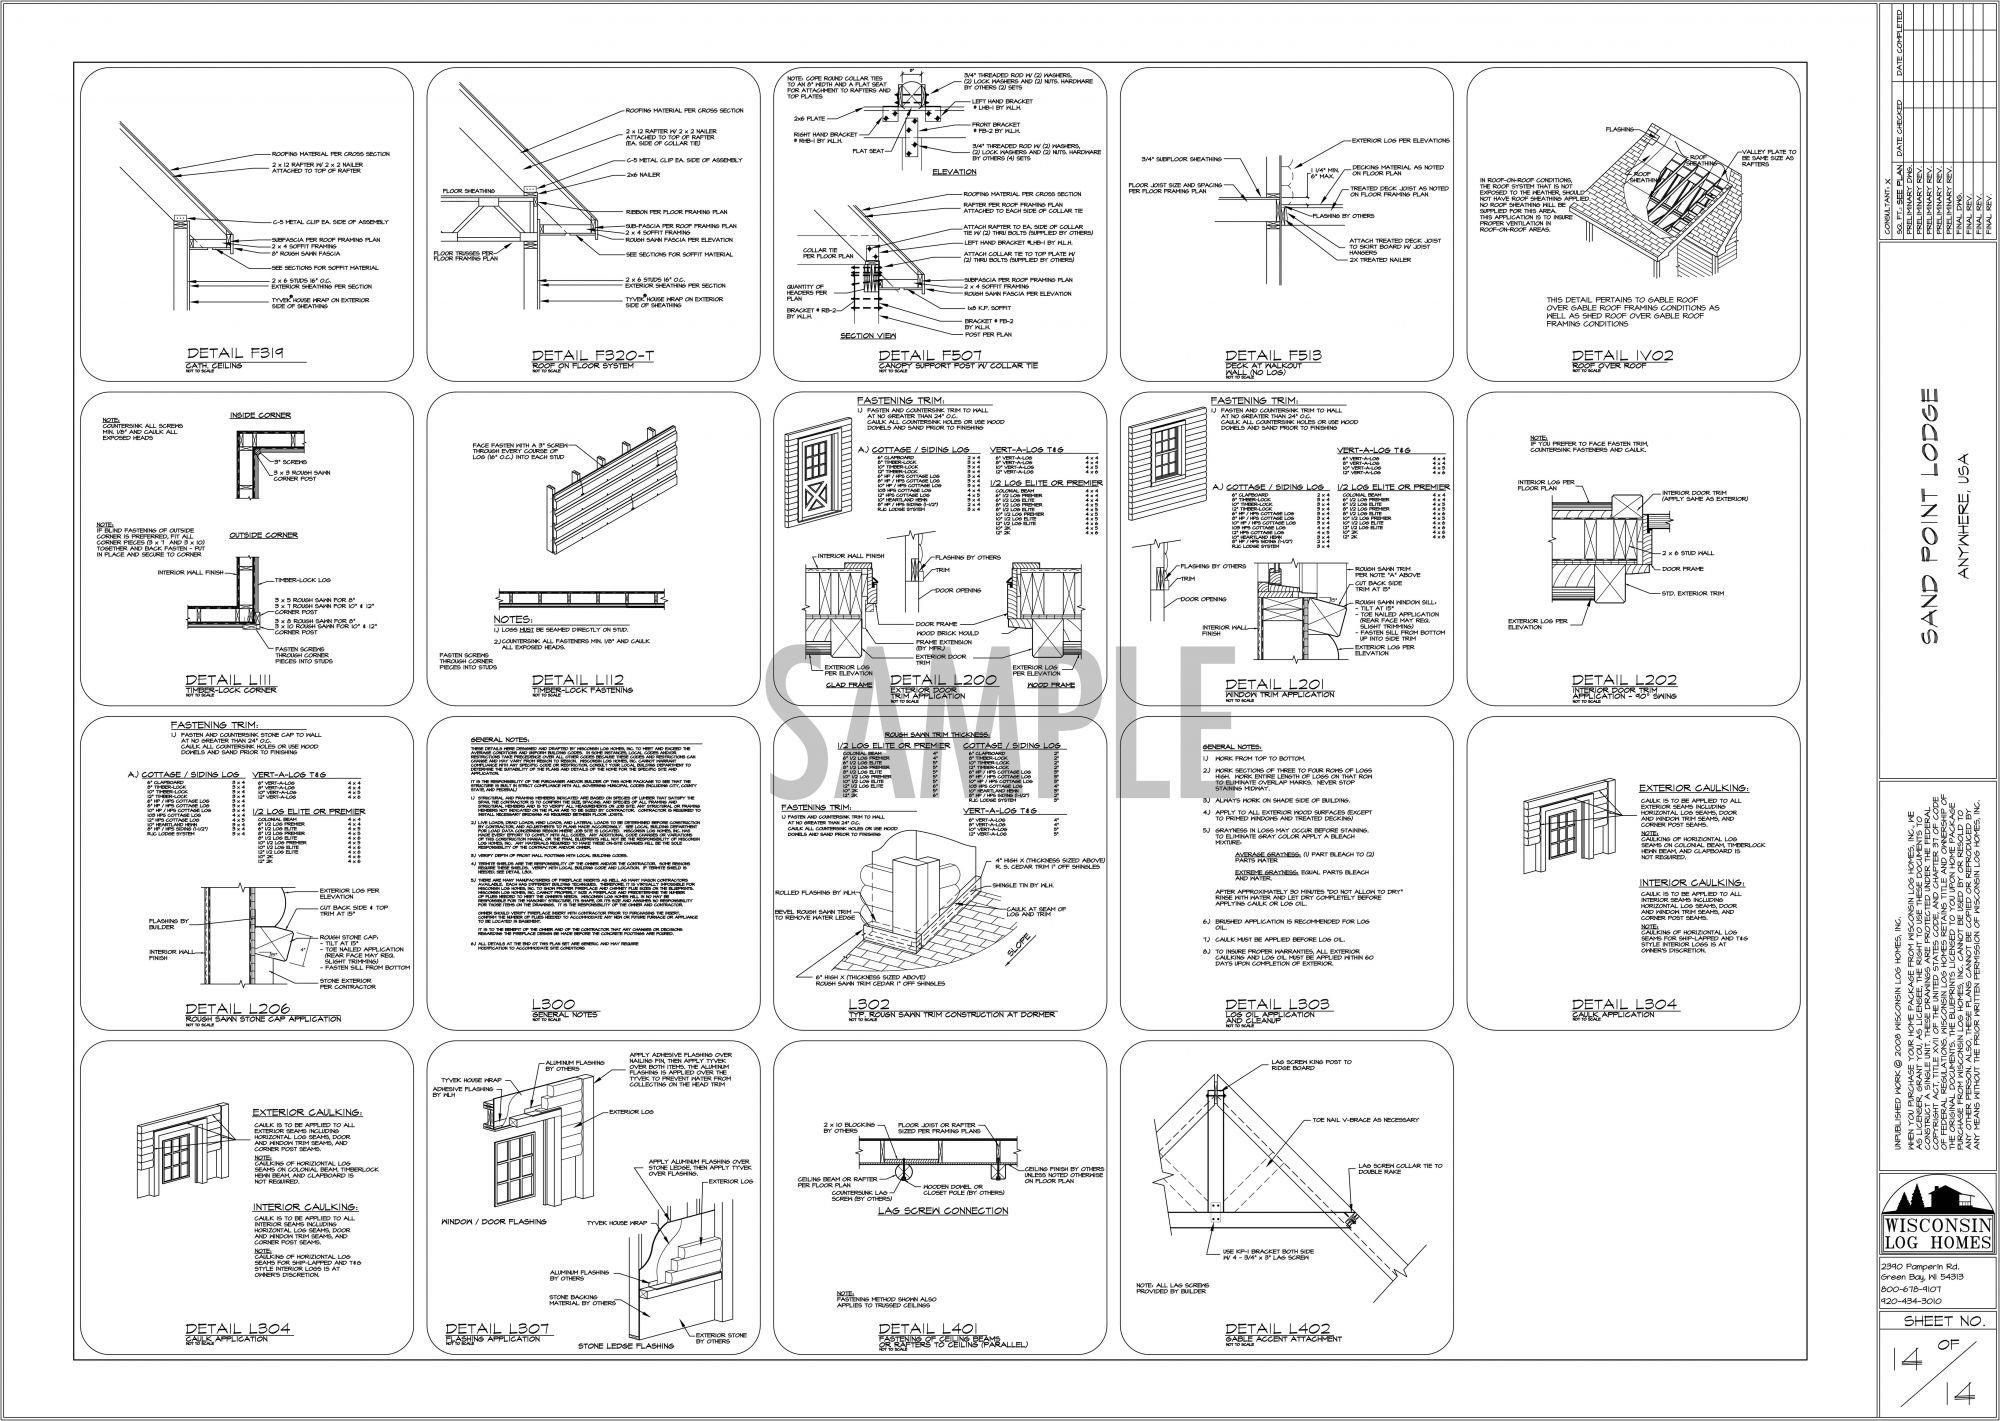 National Log Home Design & Build Services for Custom Log Homes ...